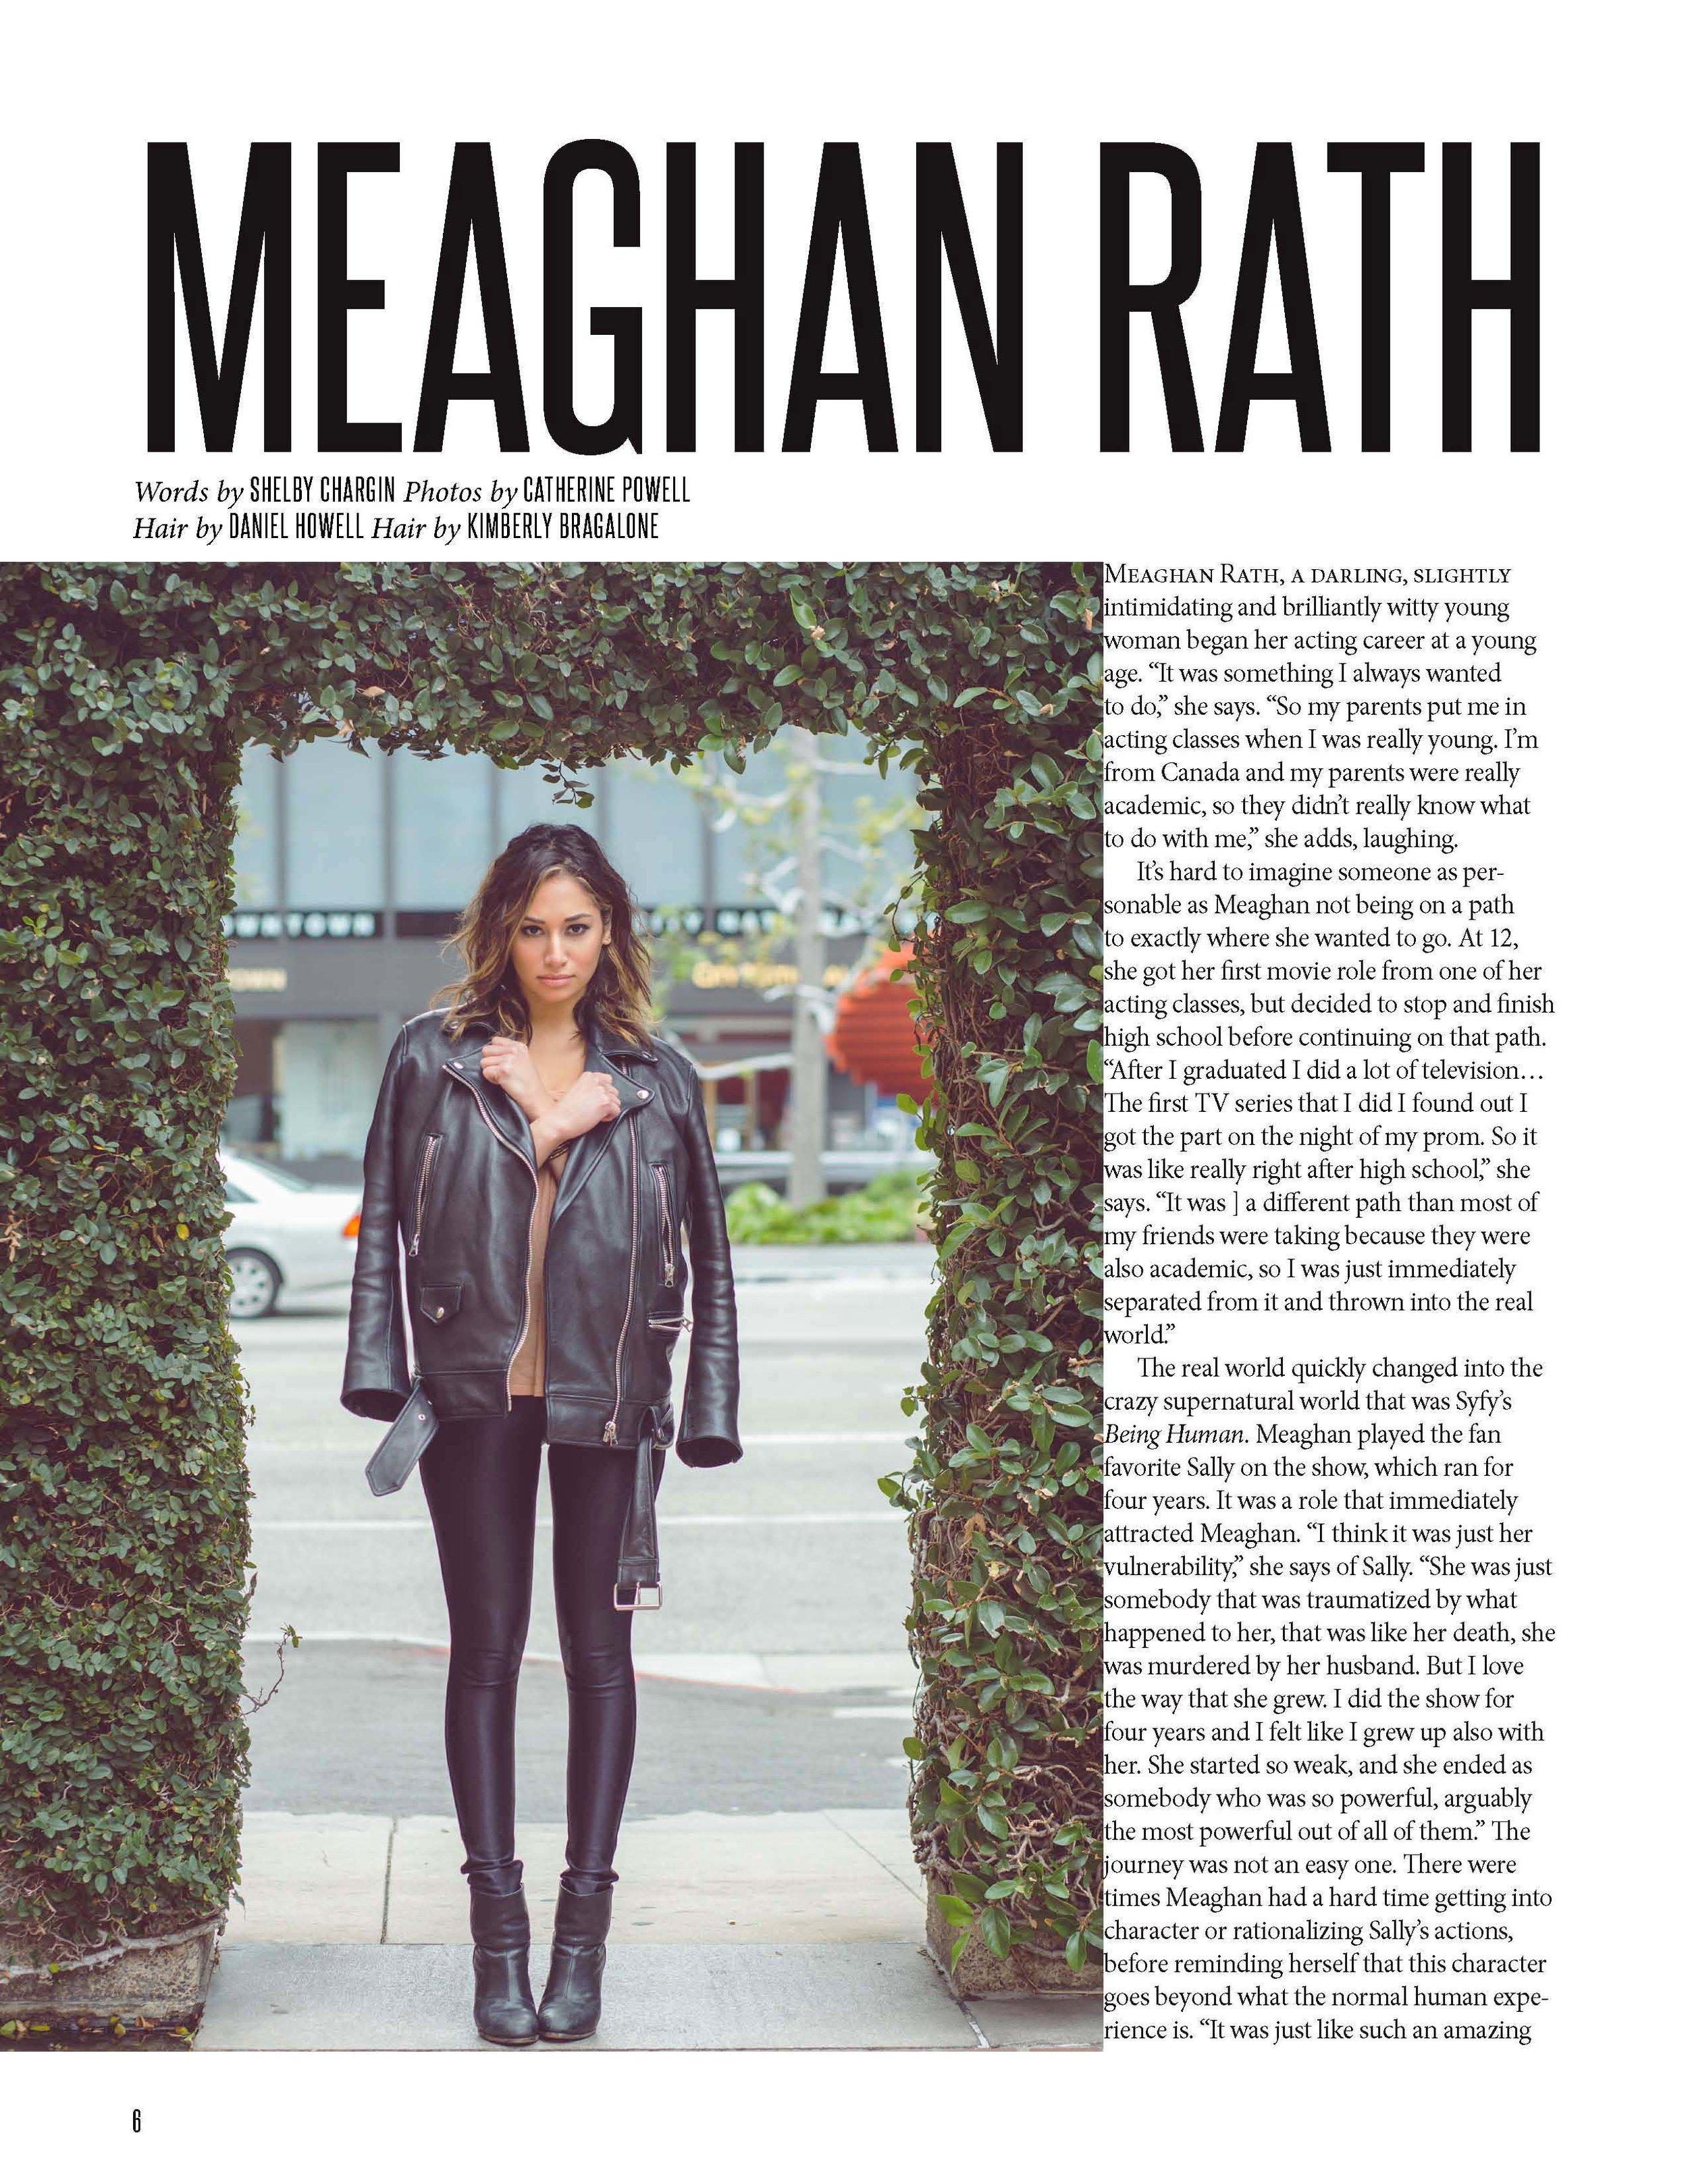 MeaghanRath NKD Mag Makeup Kim Bragalone_Page_1.jpg